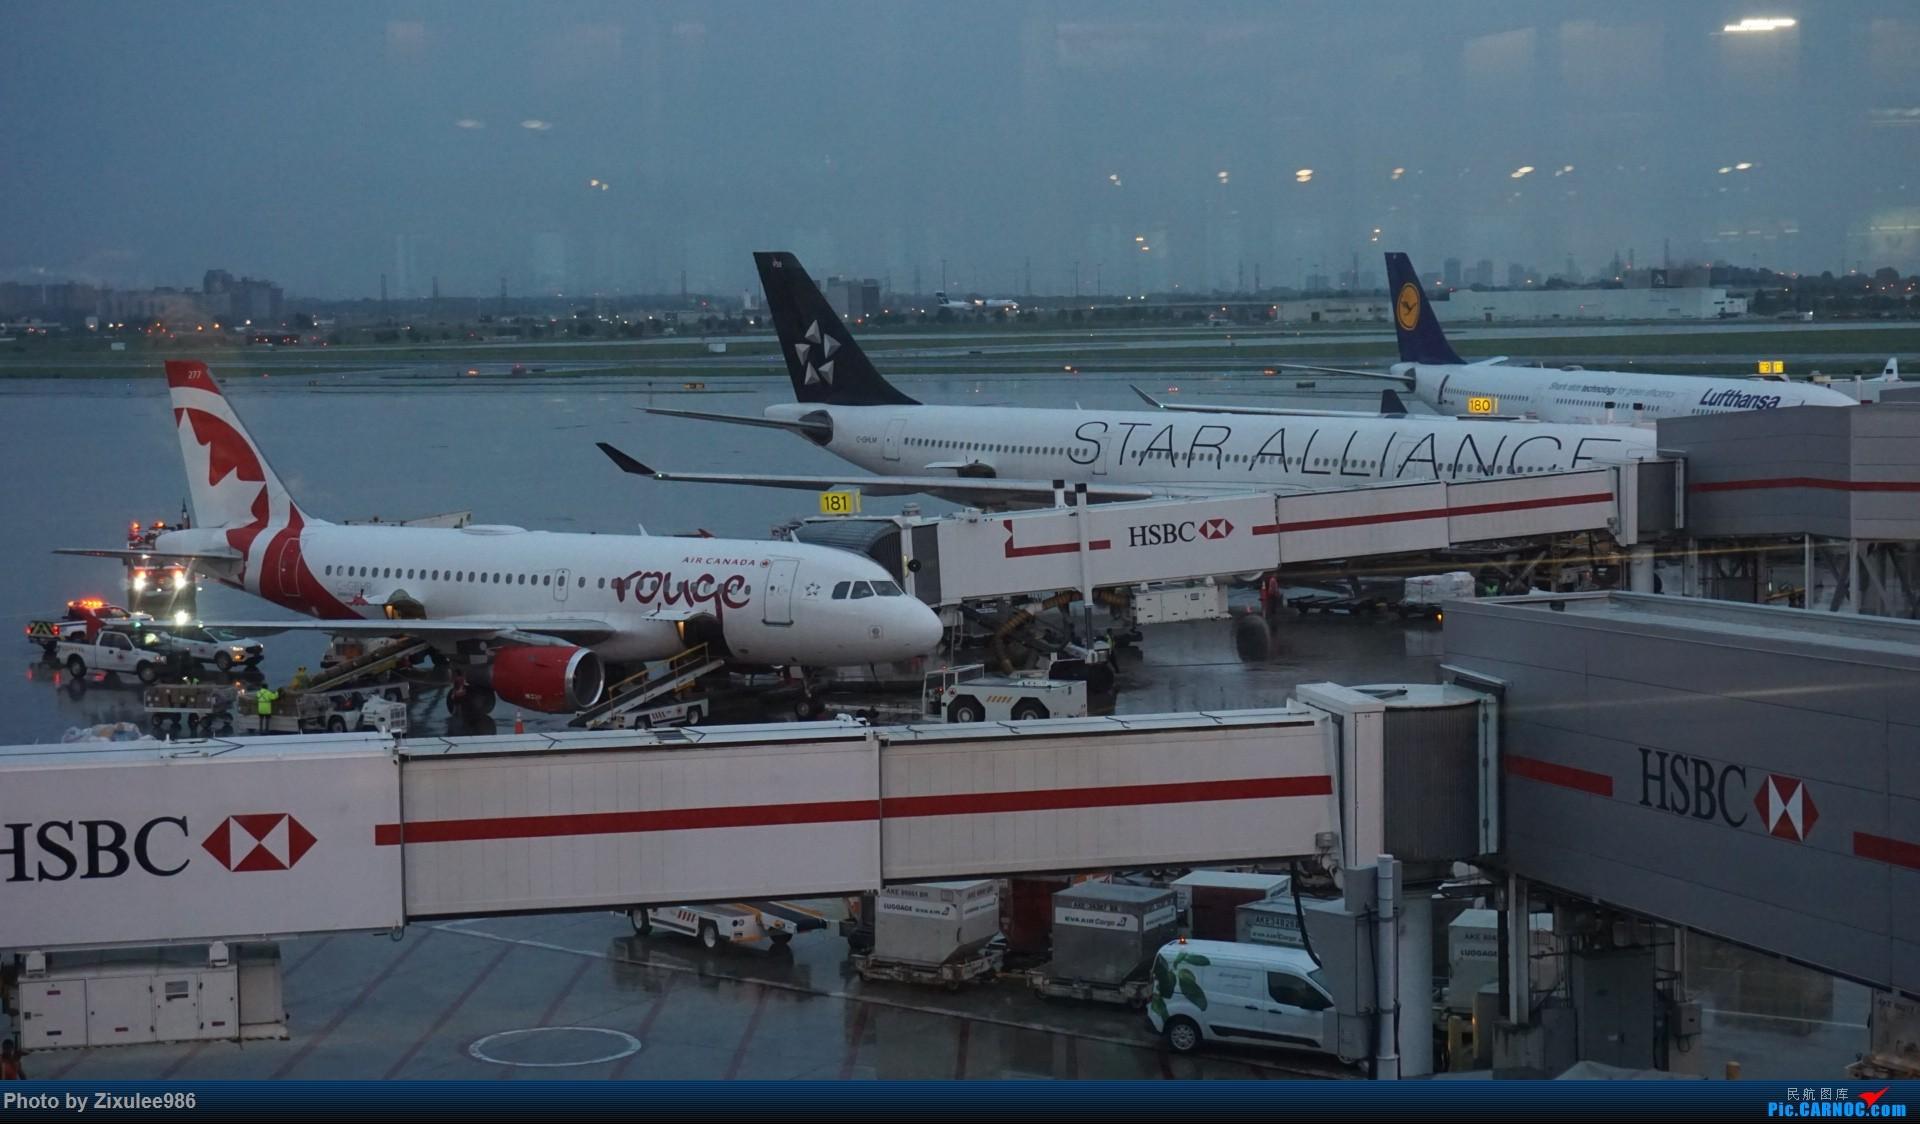 Re:[原创]加拿大21日游学之旅 (二)~加航AC28..PVG-YYZ到达多村后的雨天~多图缓更(将会附上上一集忘发的flightlog)请各位大侠谅解~ AIRBUS A320-232 C-GBHR 加拿大多伦多皮尔逊机场